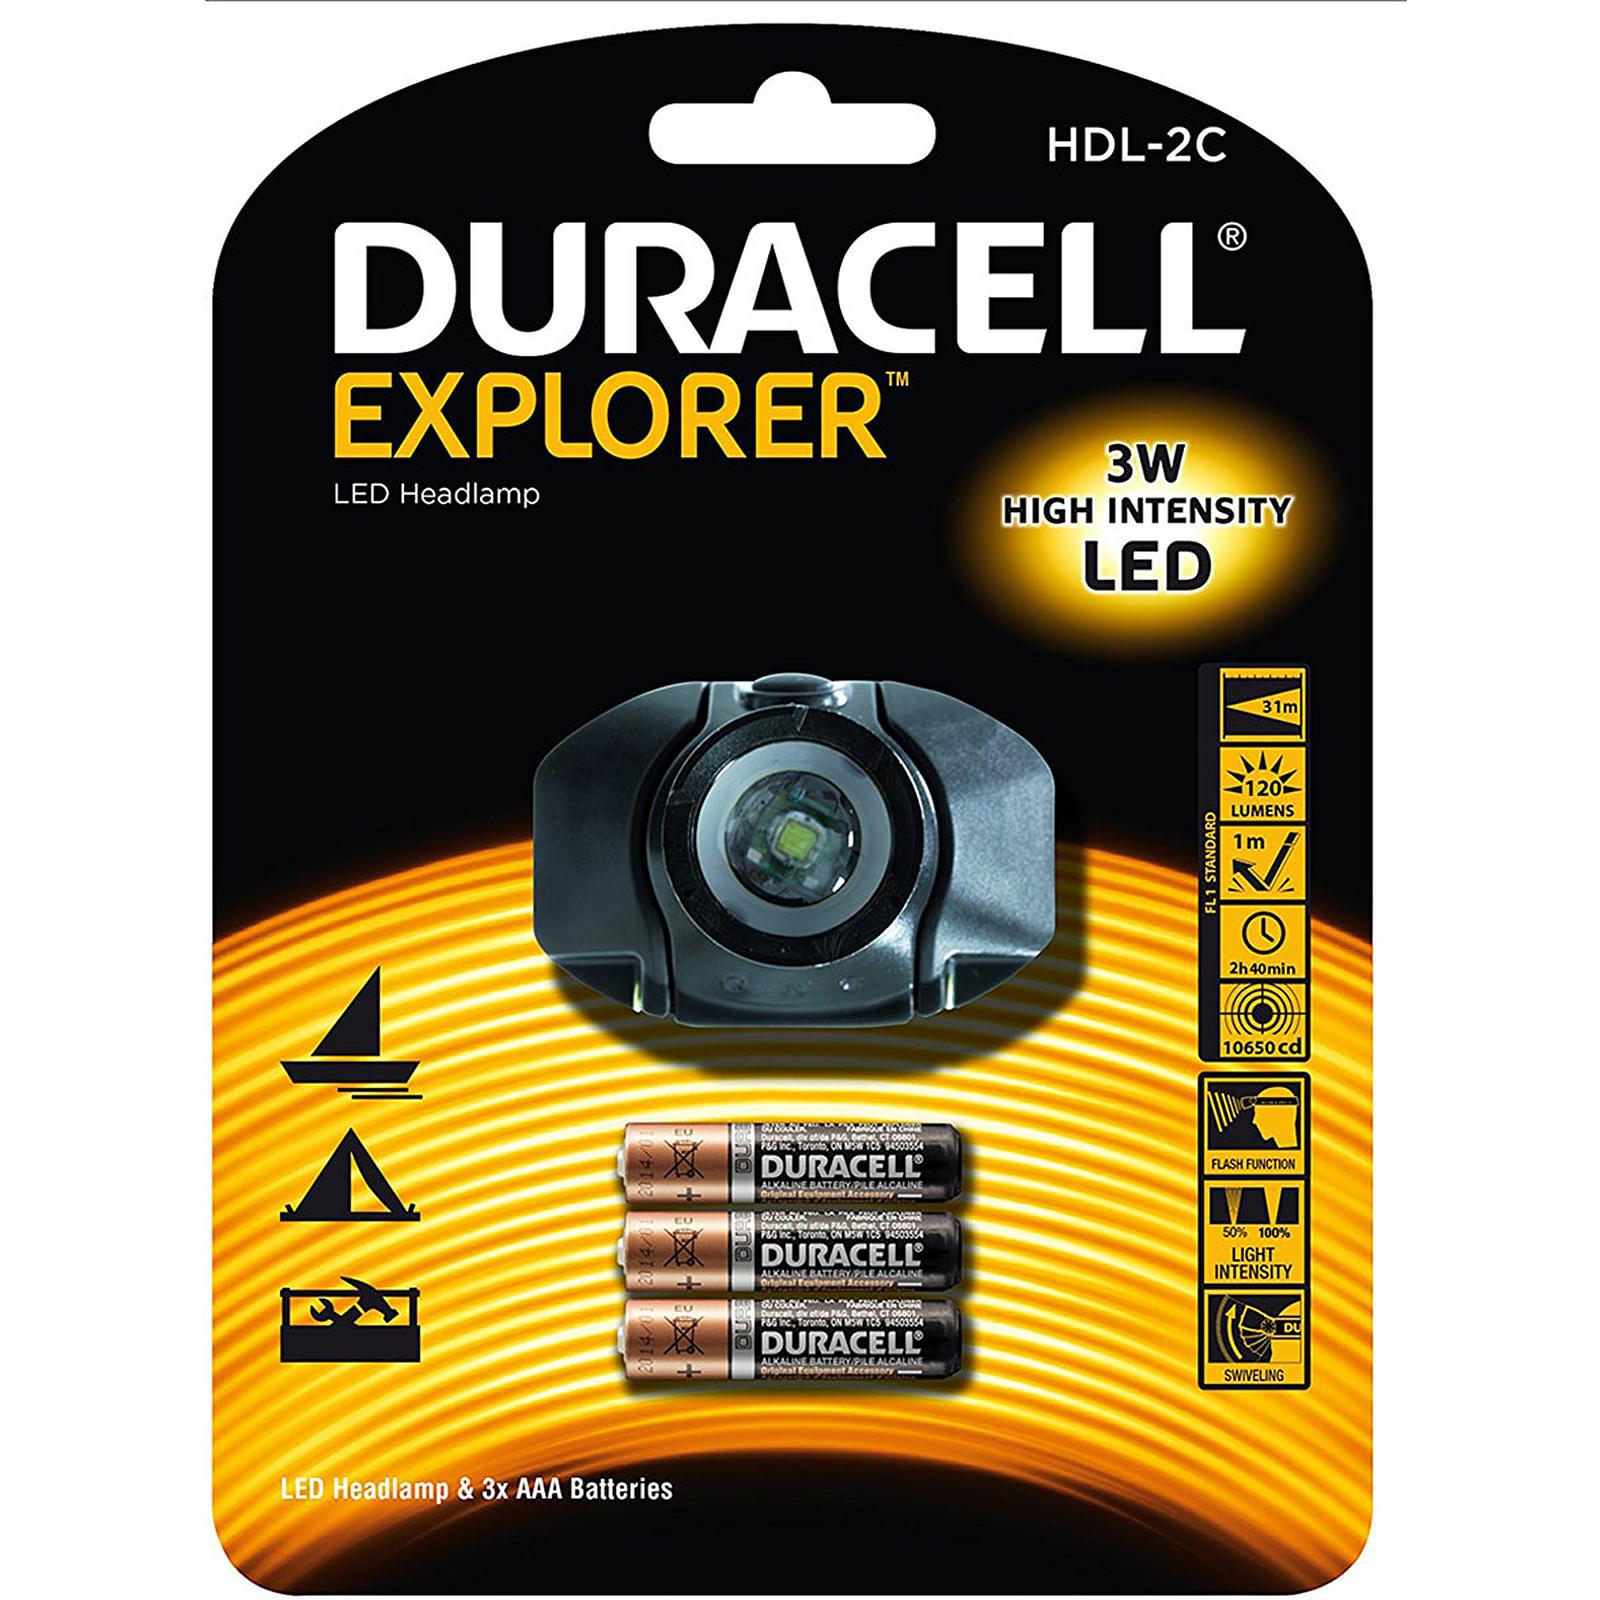 Duracell Explorer HDL-2C